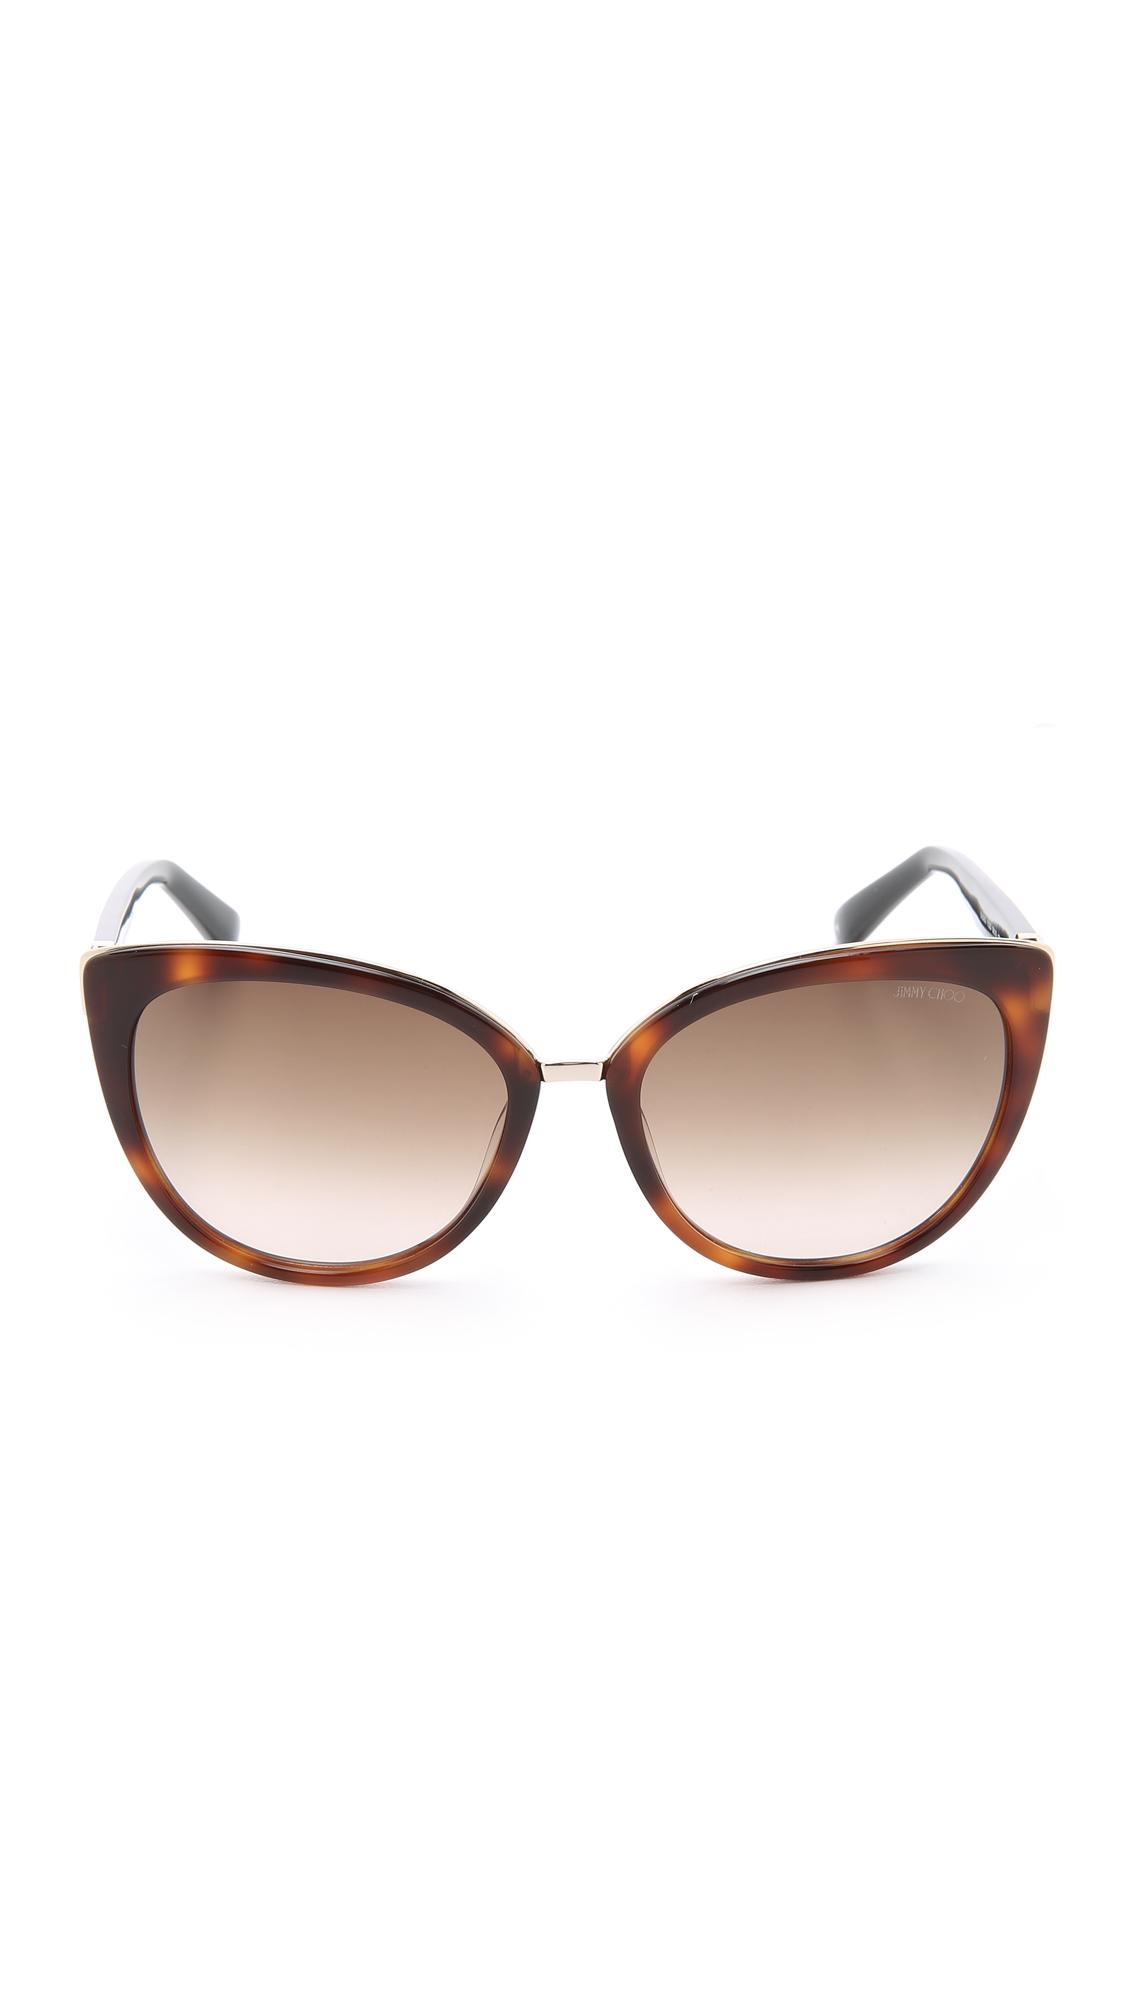 0cbb23abadb Jimmy Choo Dana Sunglasses in Brown - Lyst